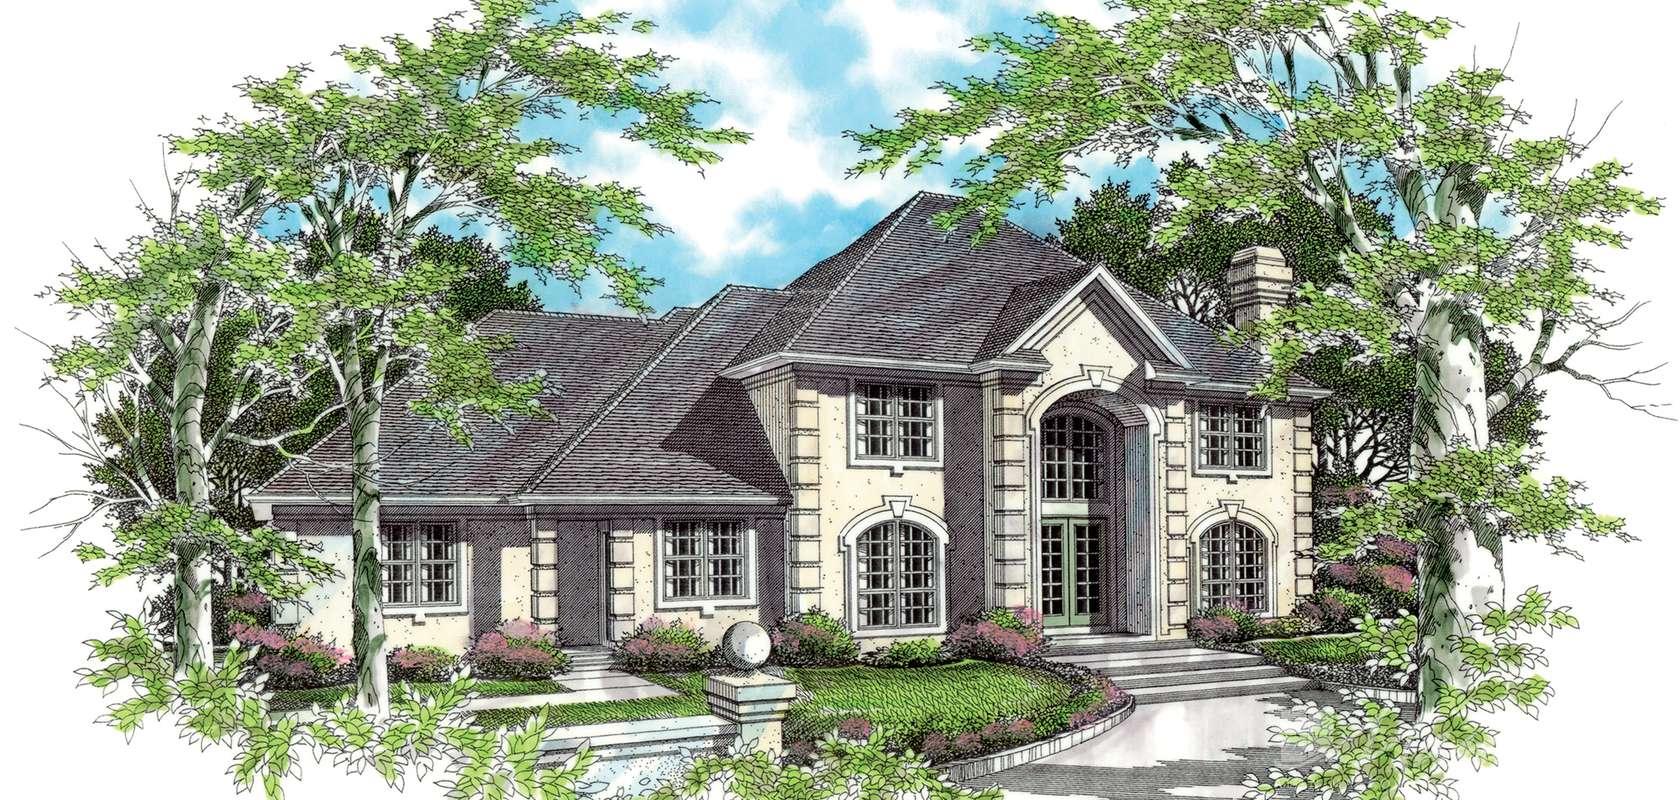 Mascord House Plan 2337: The Milbourne